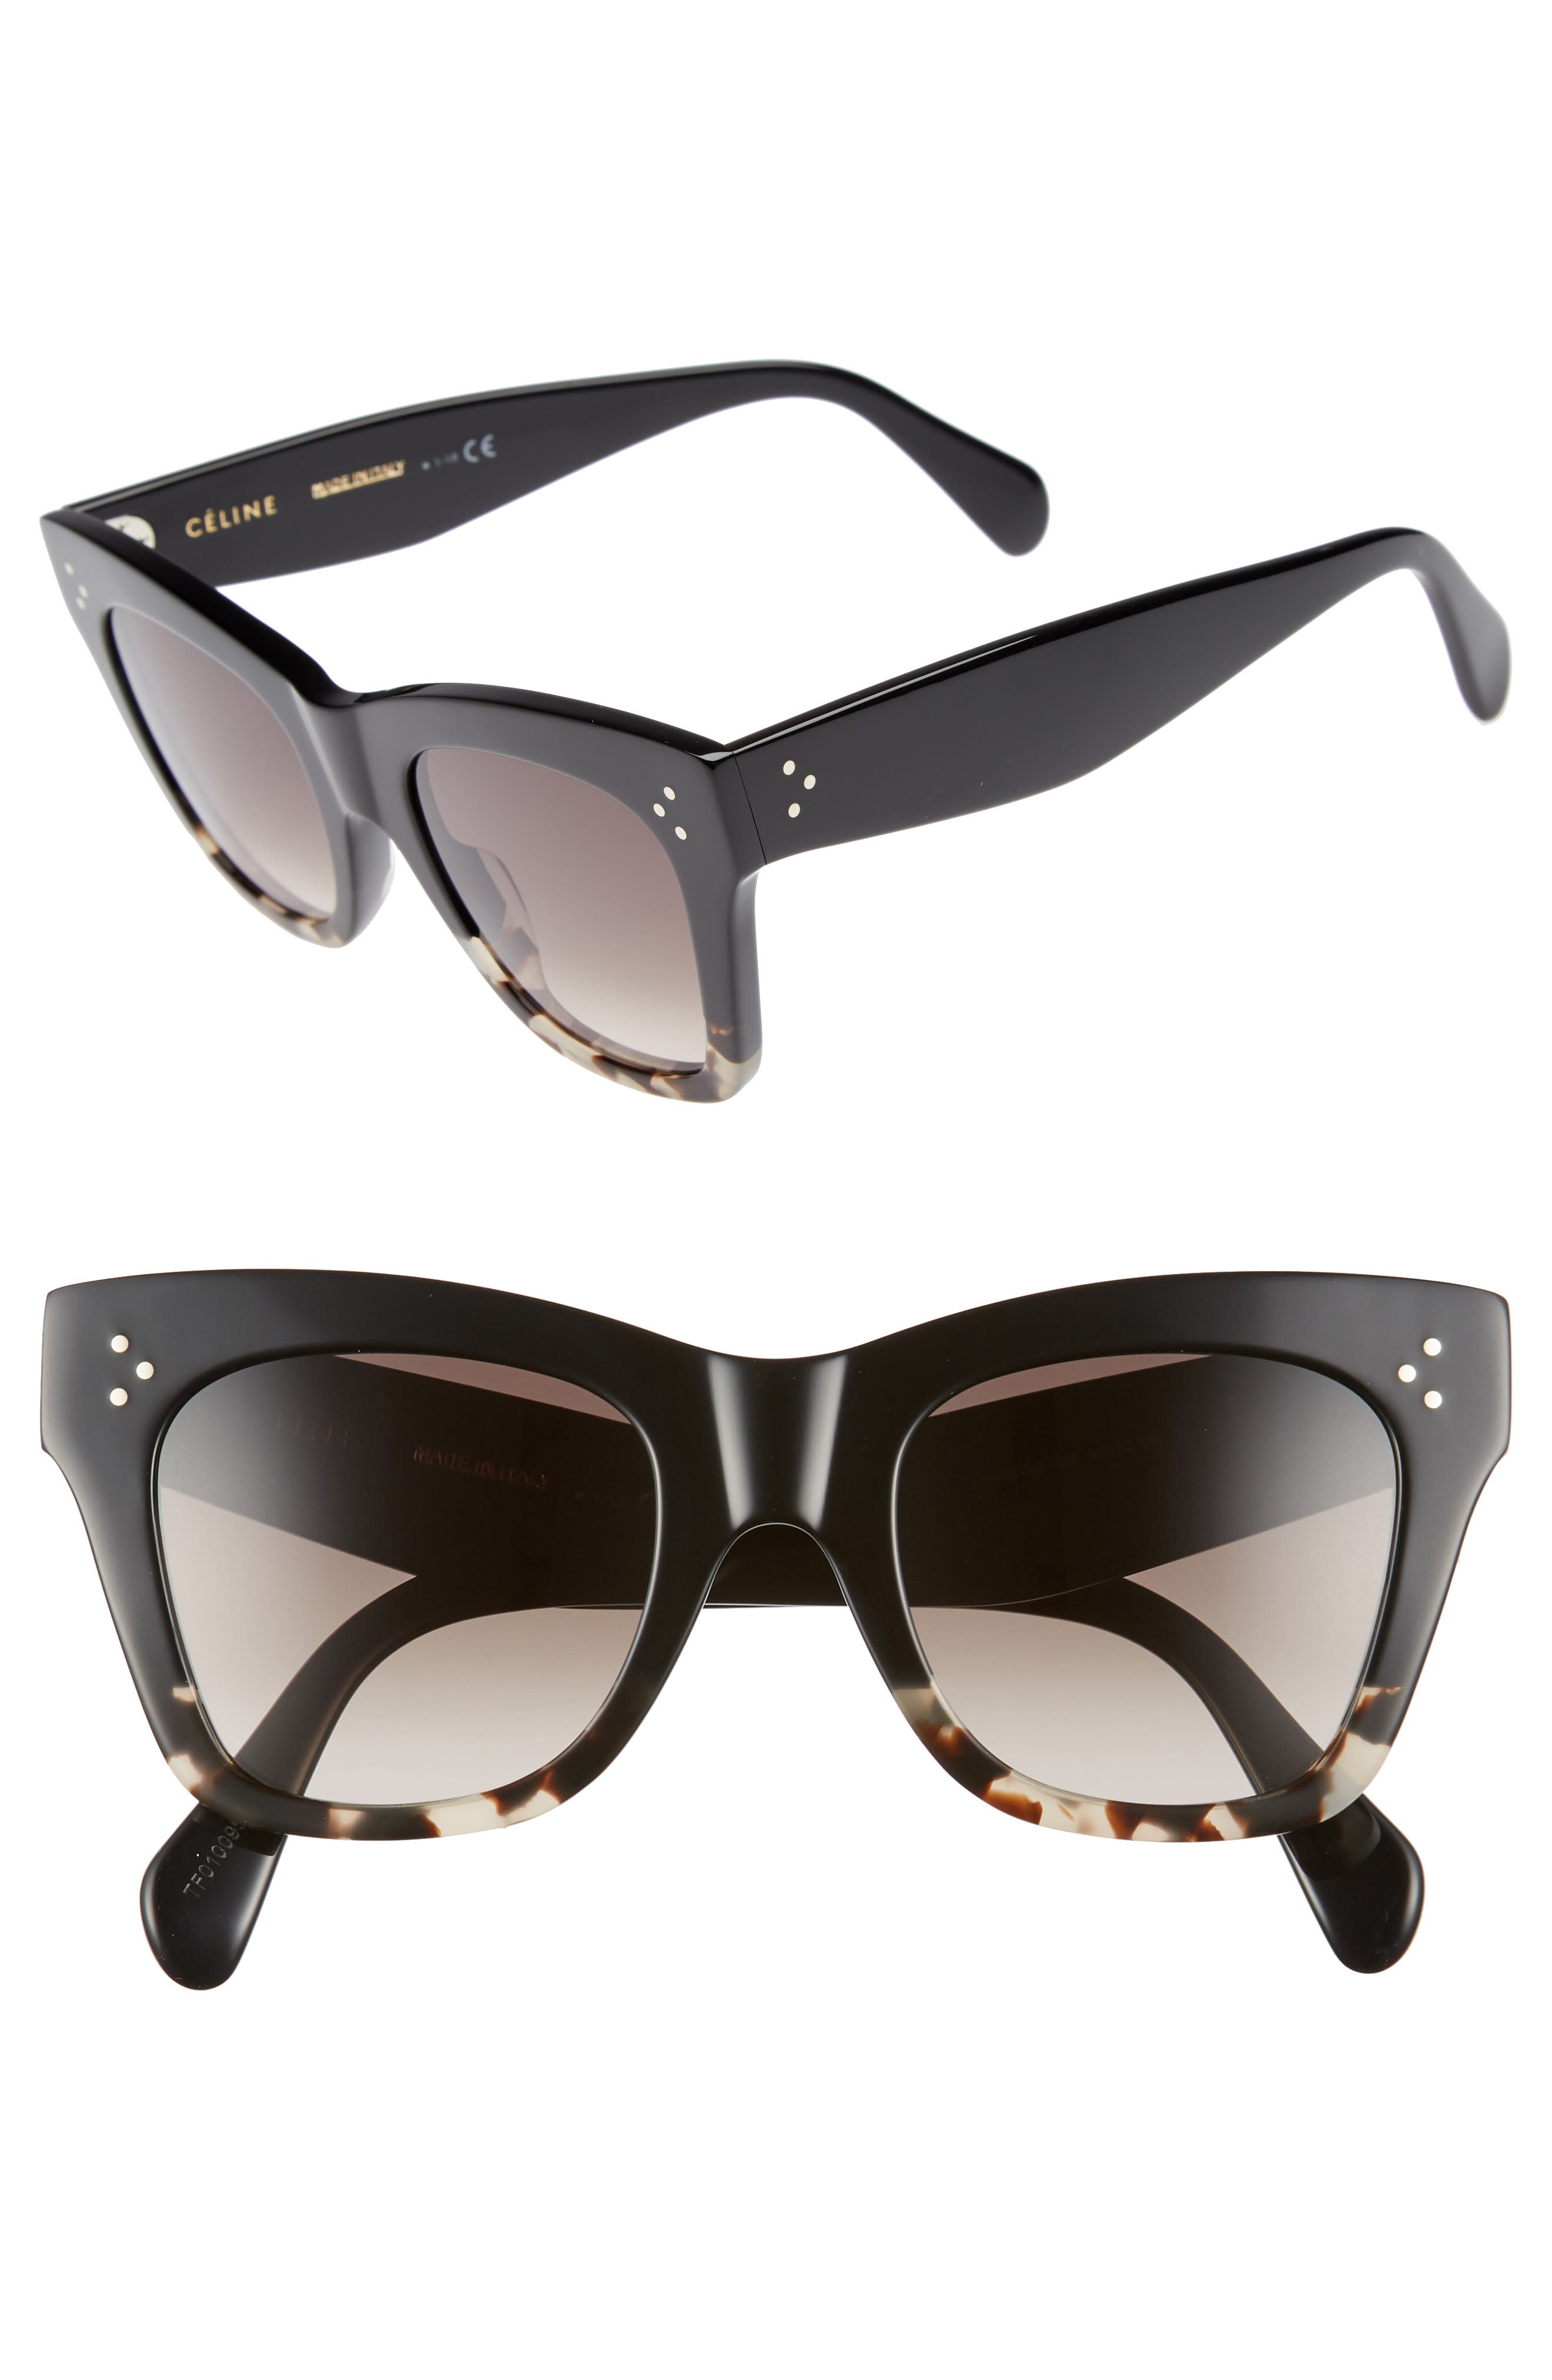 CELINE, 50mm Gradient Butterfly Sunglasses, Main thumbnail 1, color, BLACK/ GREY HAVANA/ BROWN